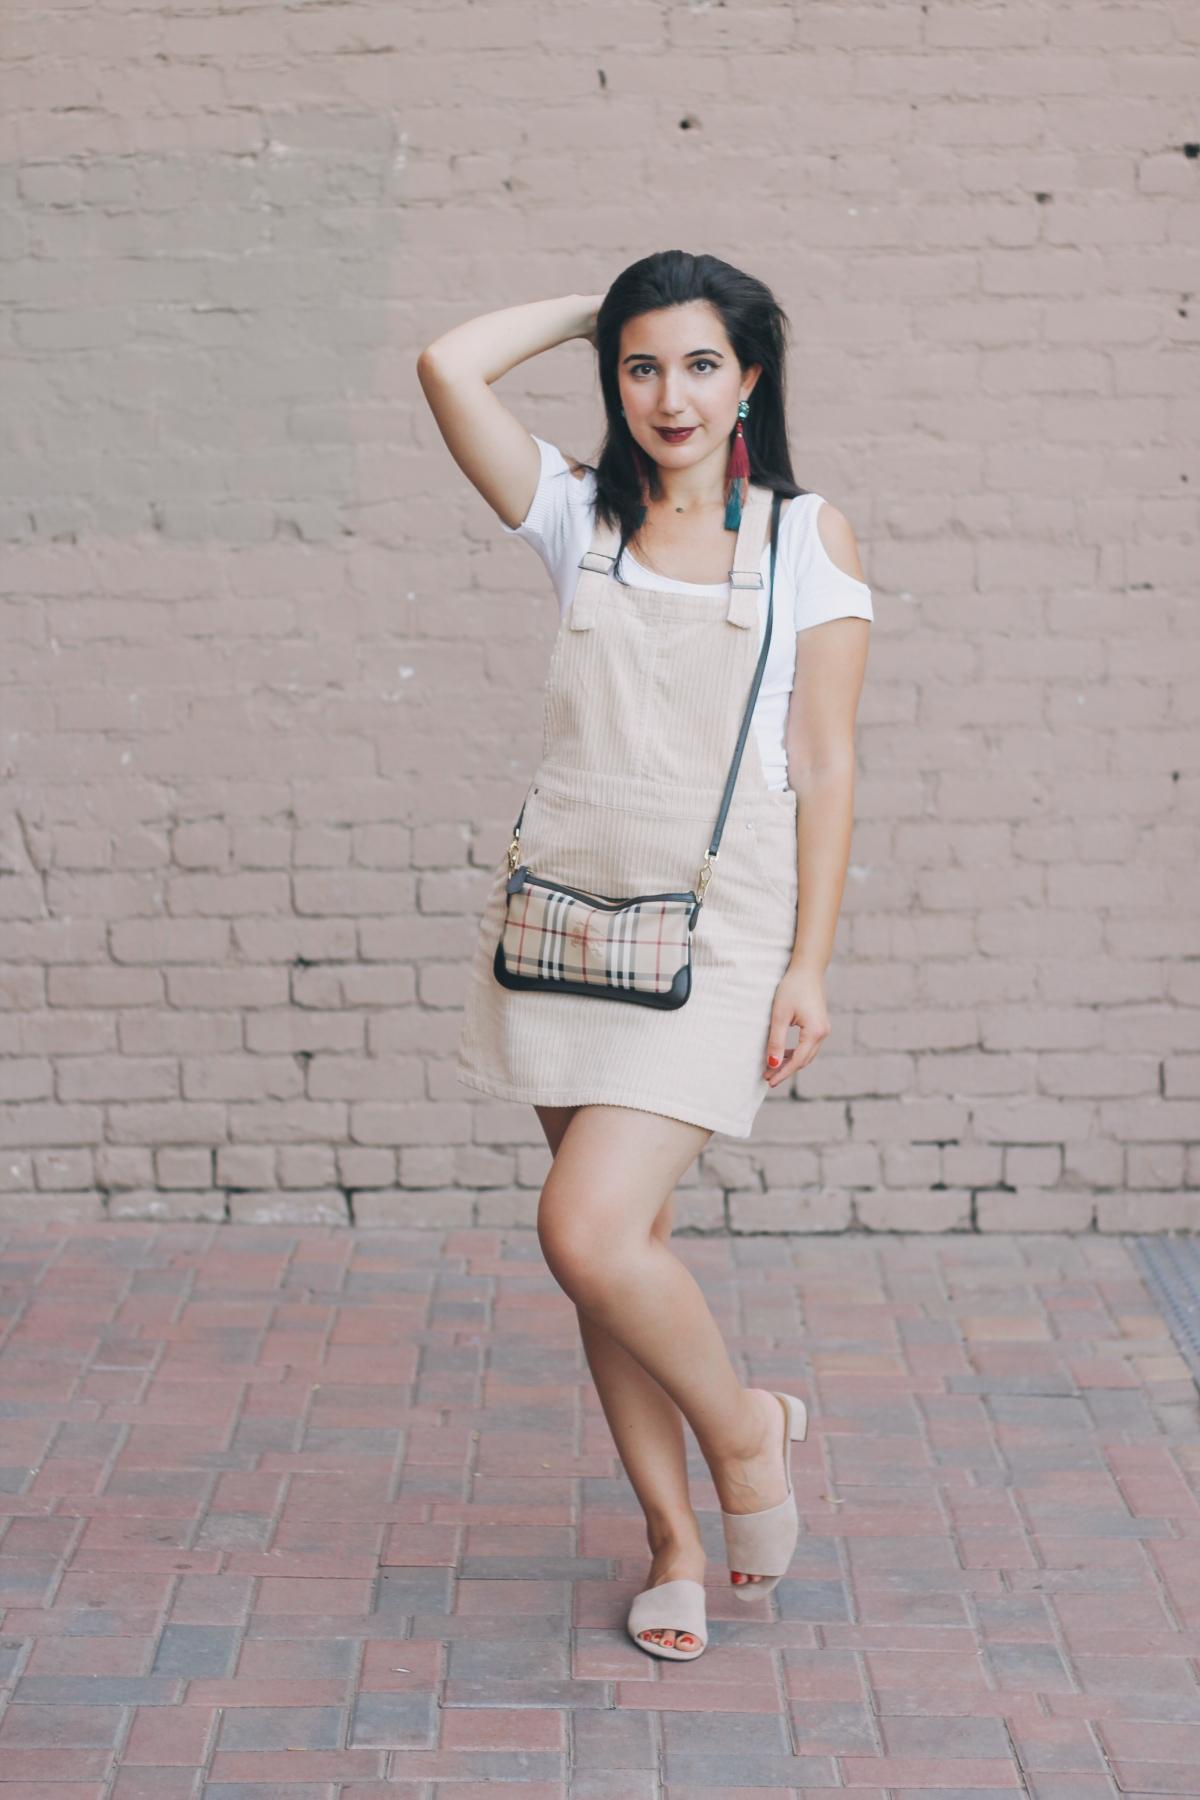 Summer Street Style (9 of 10)